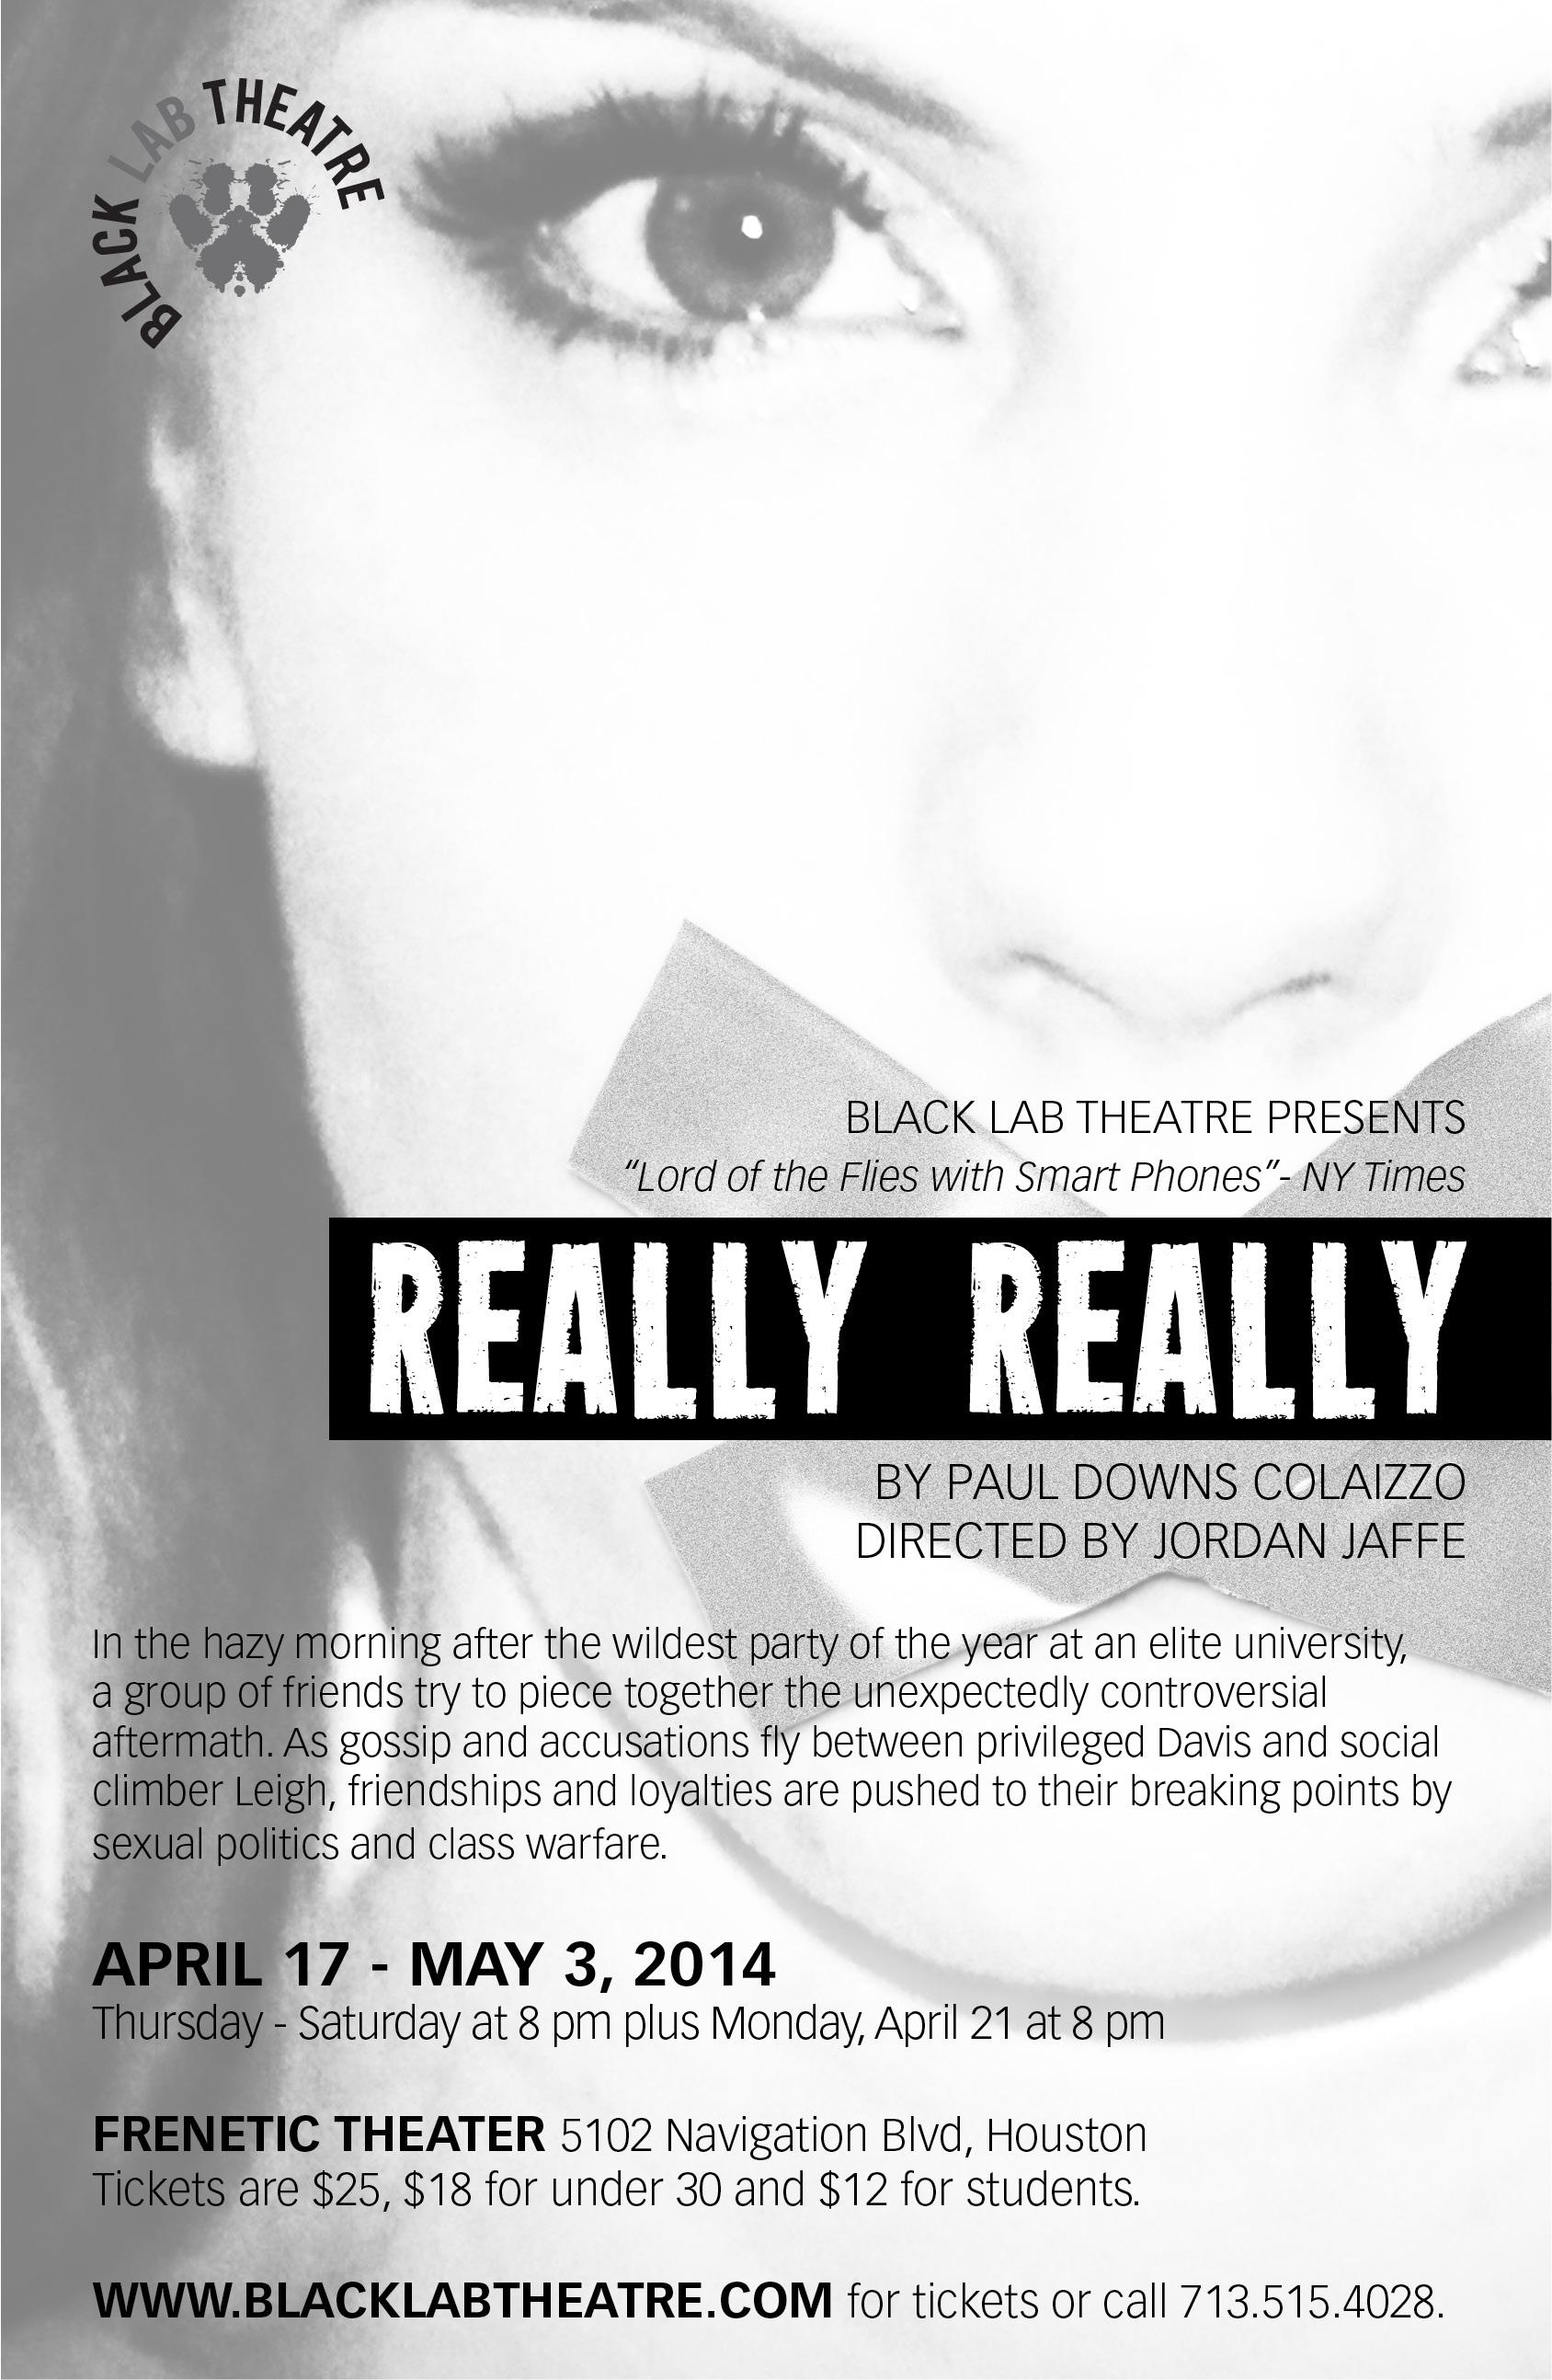 BL-ReallyReally-Poster-Web.jpg